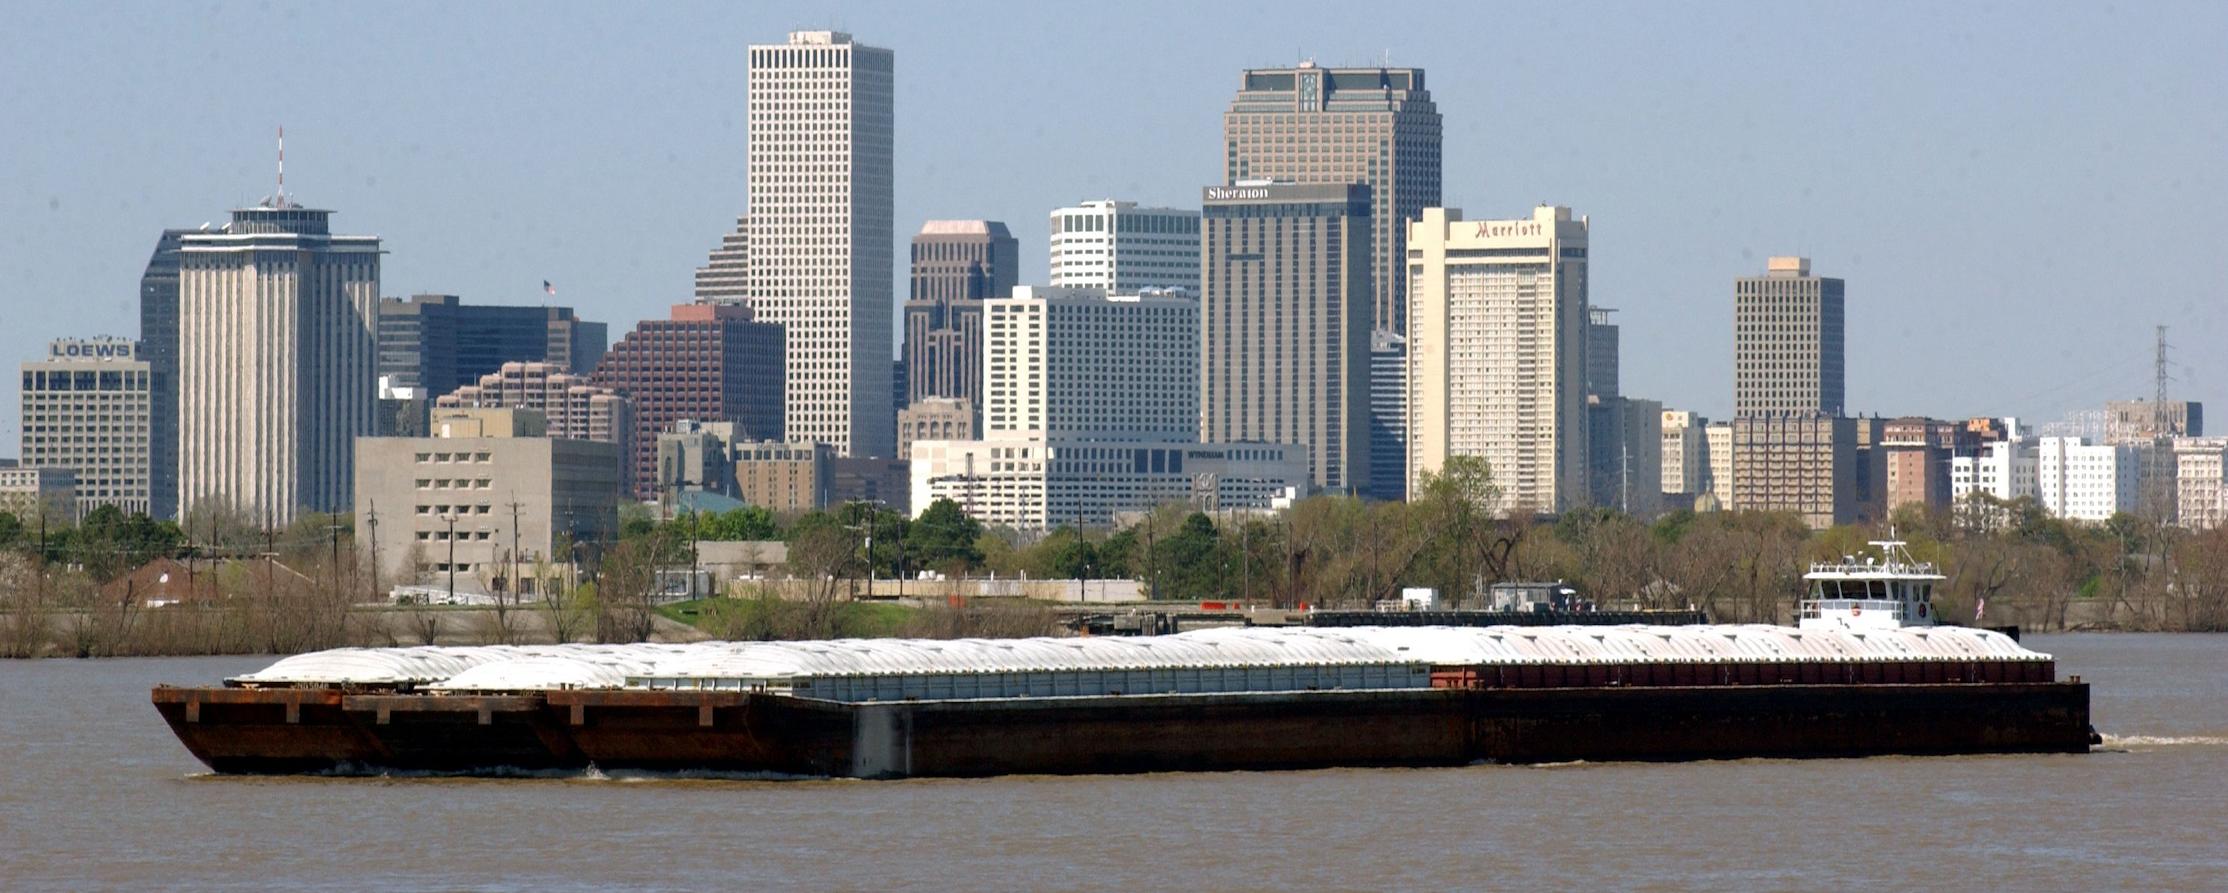 Port of Orleans